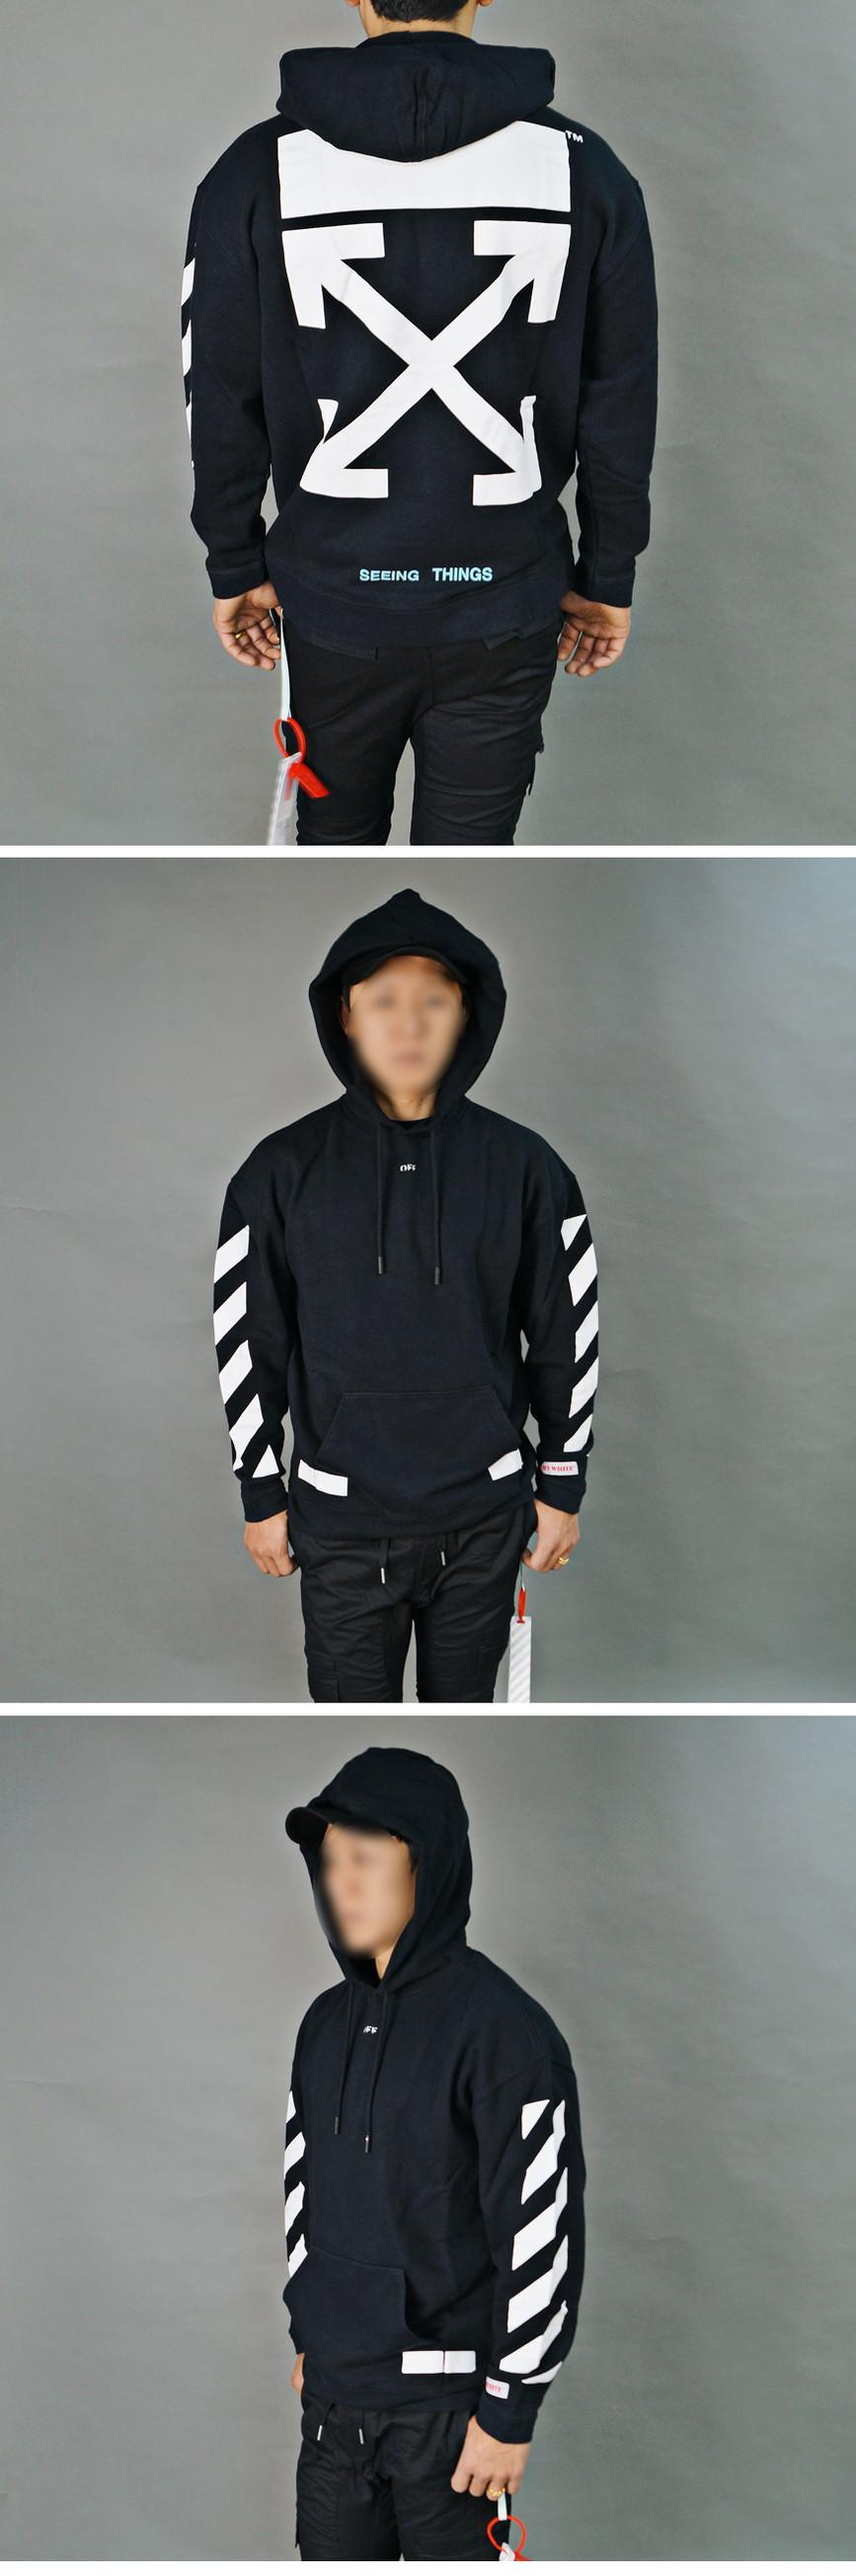 a77db6e5773 머스트잇(MUSTIT) - 인천 데님샵 [18FW] 오프화이트 다이아그 애로우 오버 후드 블랙